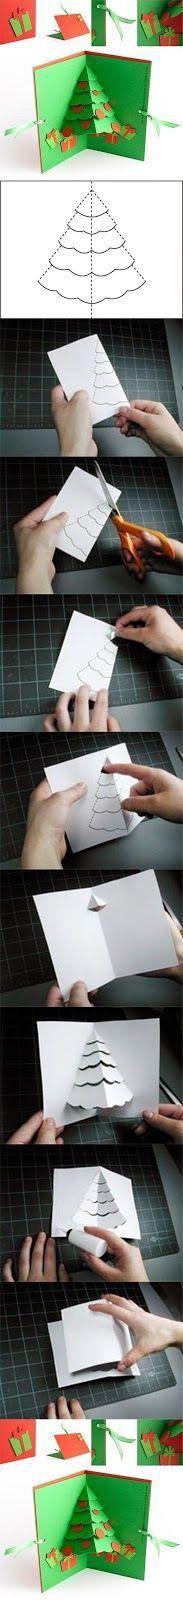 DIY Christmas Tree Pop Up Card | Christmas Special